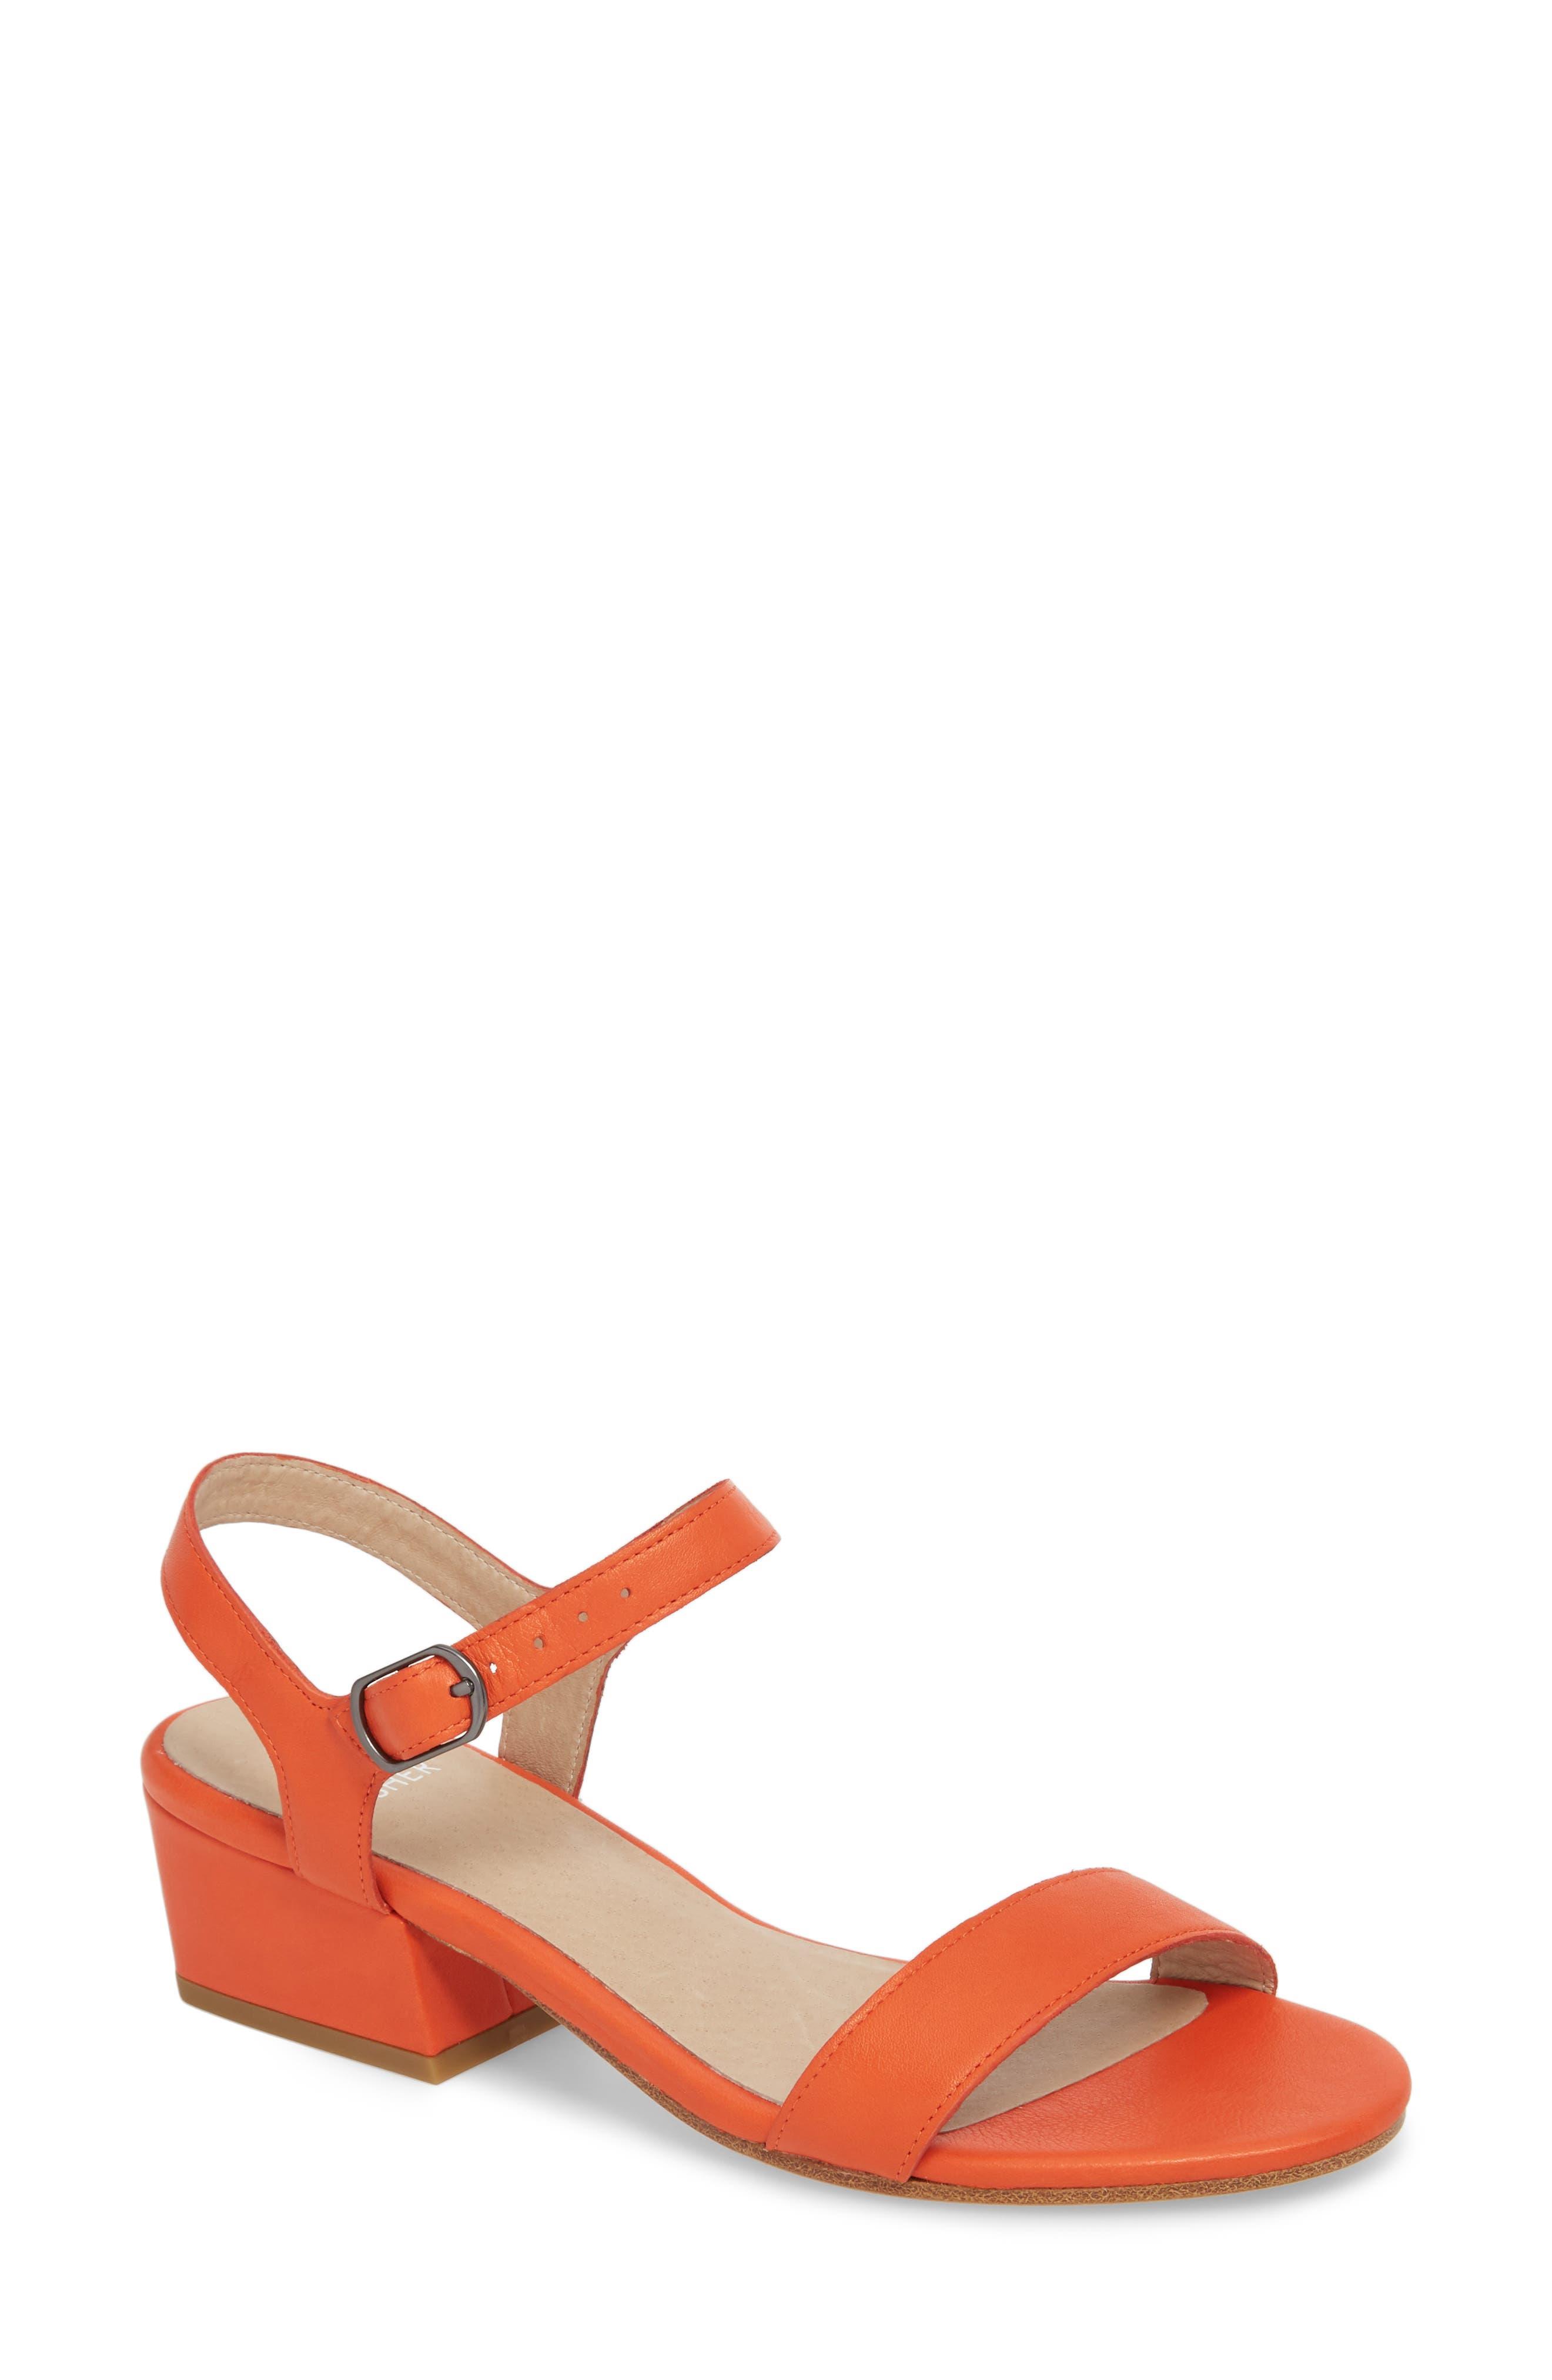 Olean Quarter Strap Sandal,                             Main thumbnail 1, color,                             Blood Orange Leather